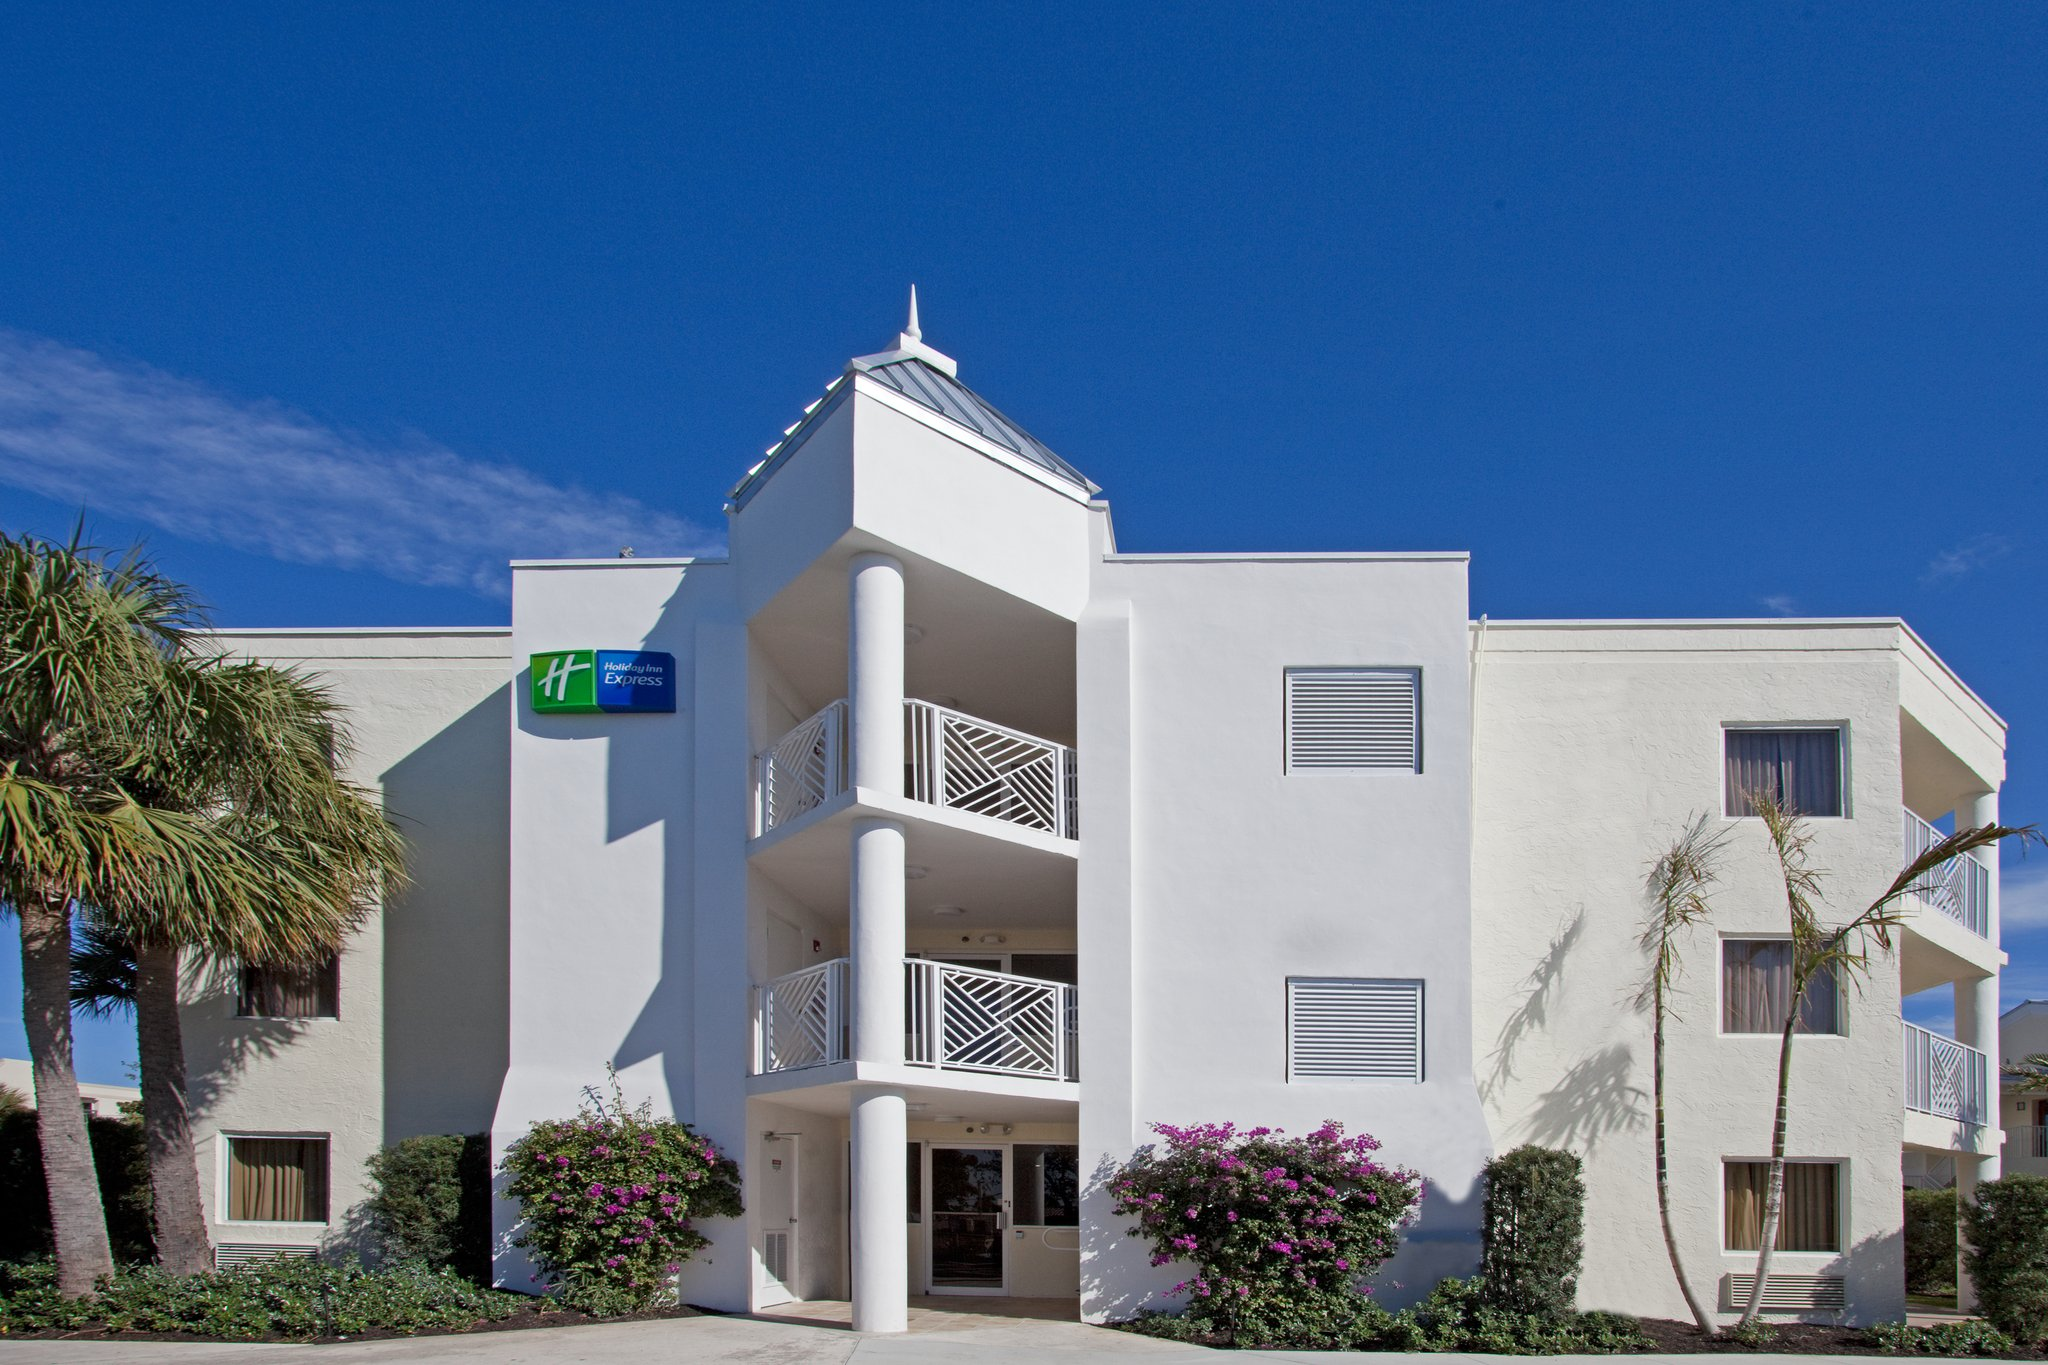 Holiday Inn Express North Palm Beach